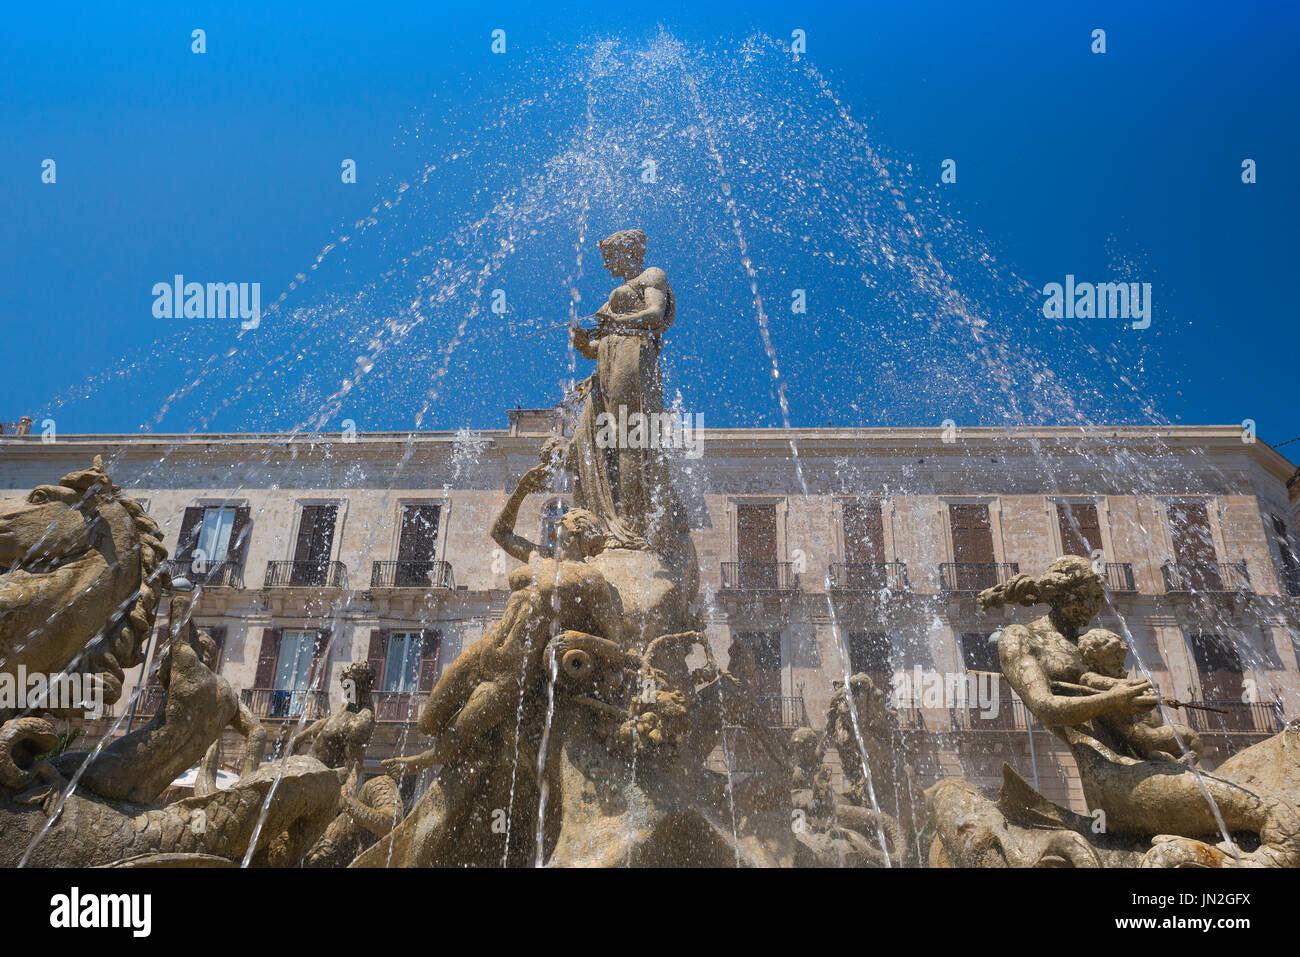 Syrakus Sizilien-Brunnen, den berühmten Brunnen von Artemis in die Piazza Archimede in Ortigia, Syrakus, Sizilien. Stockbild